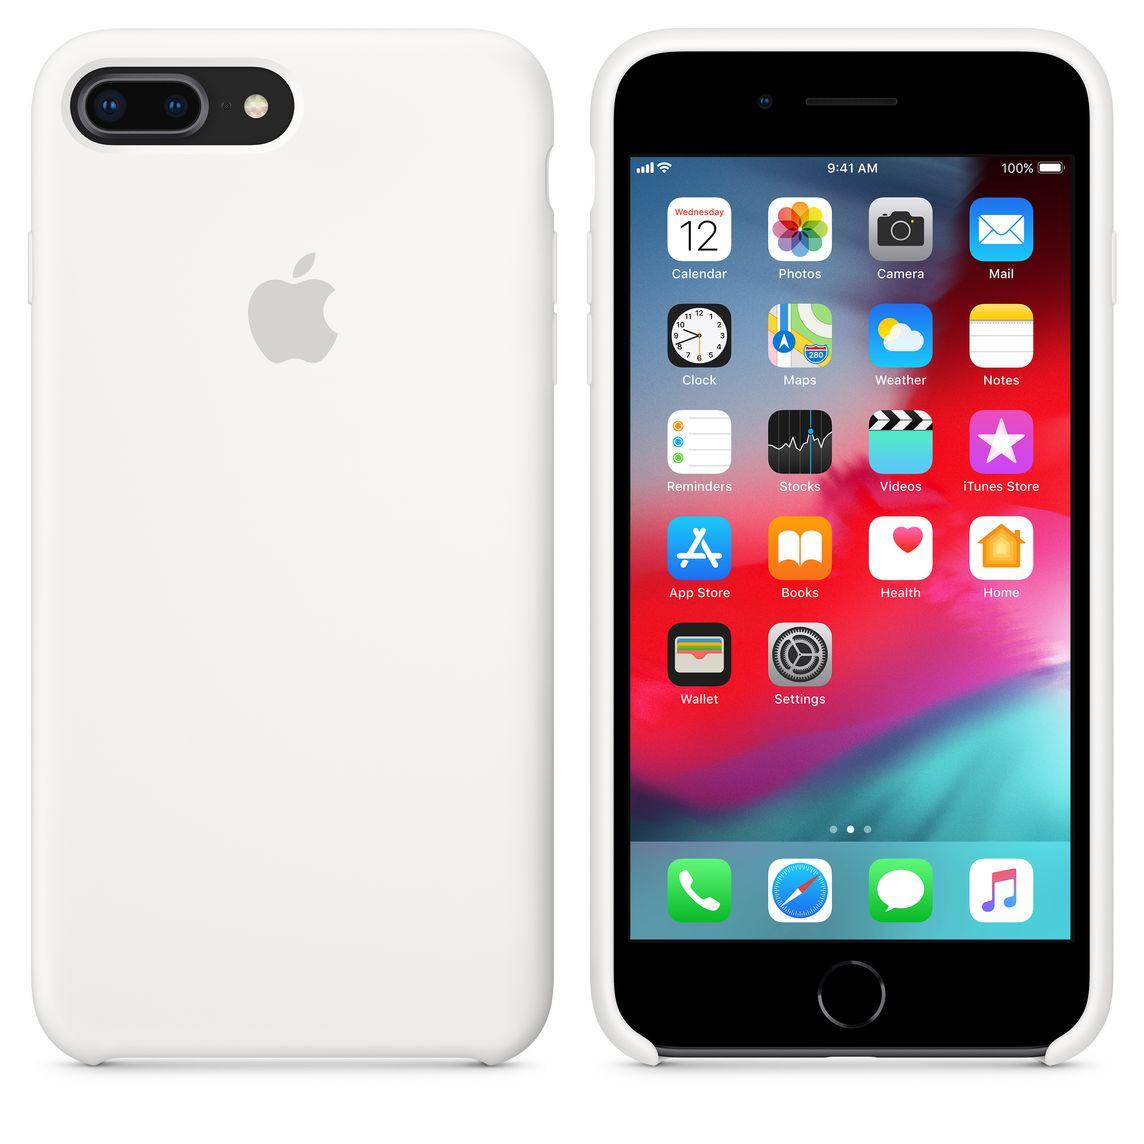 new products 4c6fd 65e09 iPhone 8 Plus / 7 Plus Silicone Case - White